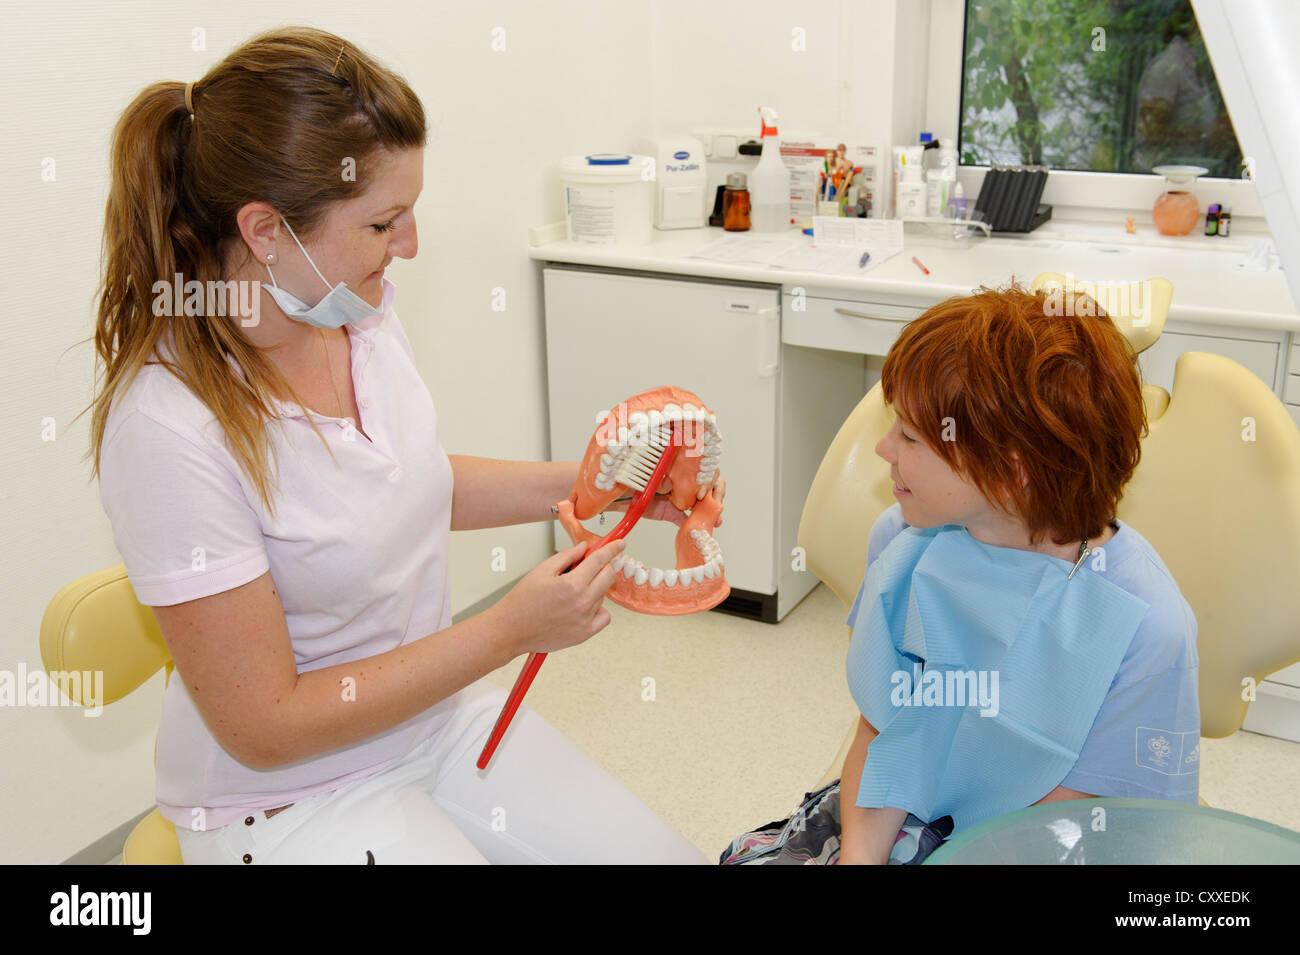 Boy at the dentist's, receiving instructions for dental care on a model, dental hygiene, dental care, dental - Stock Image